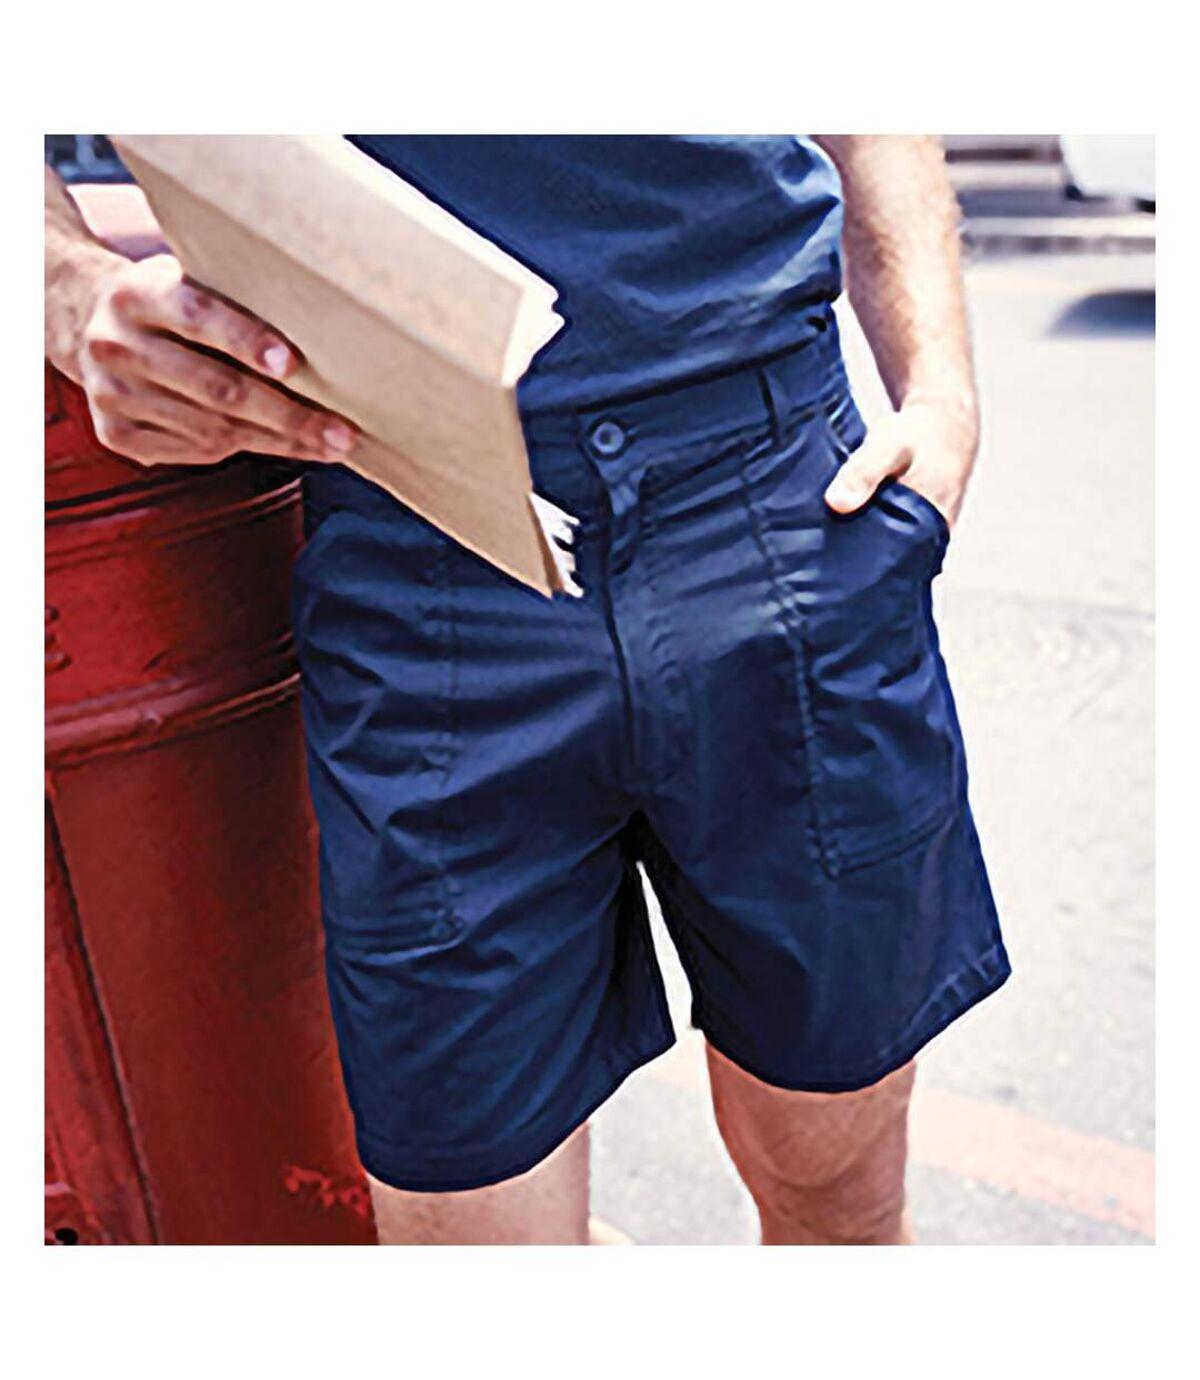 Regatta Mens New Action Sports Shorts (Navy) - UTRW1235